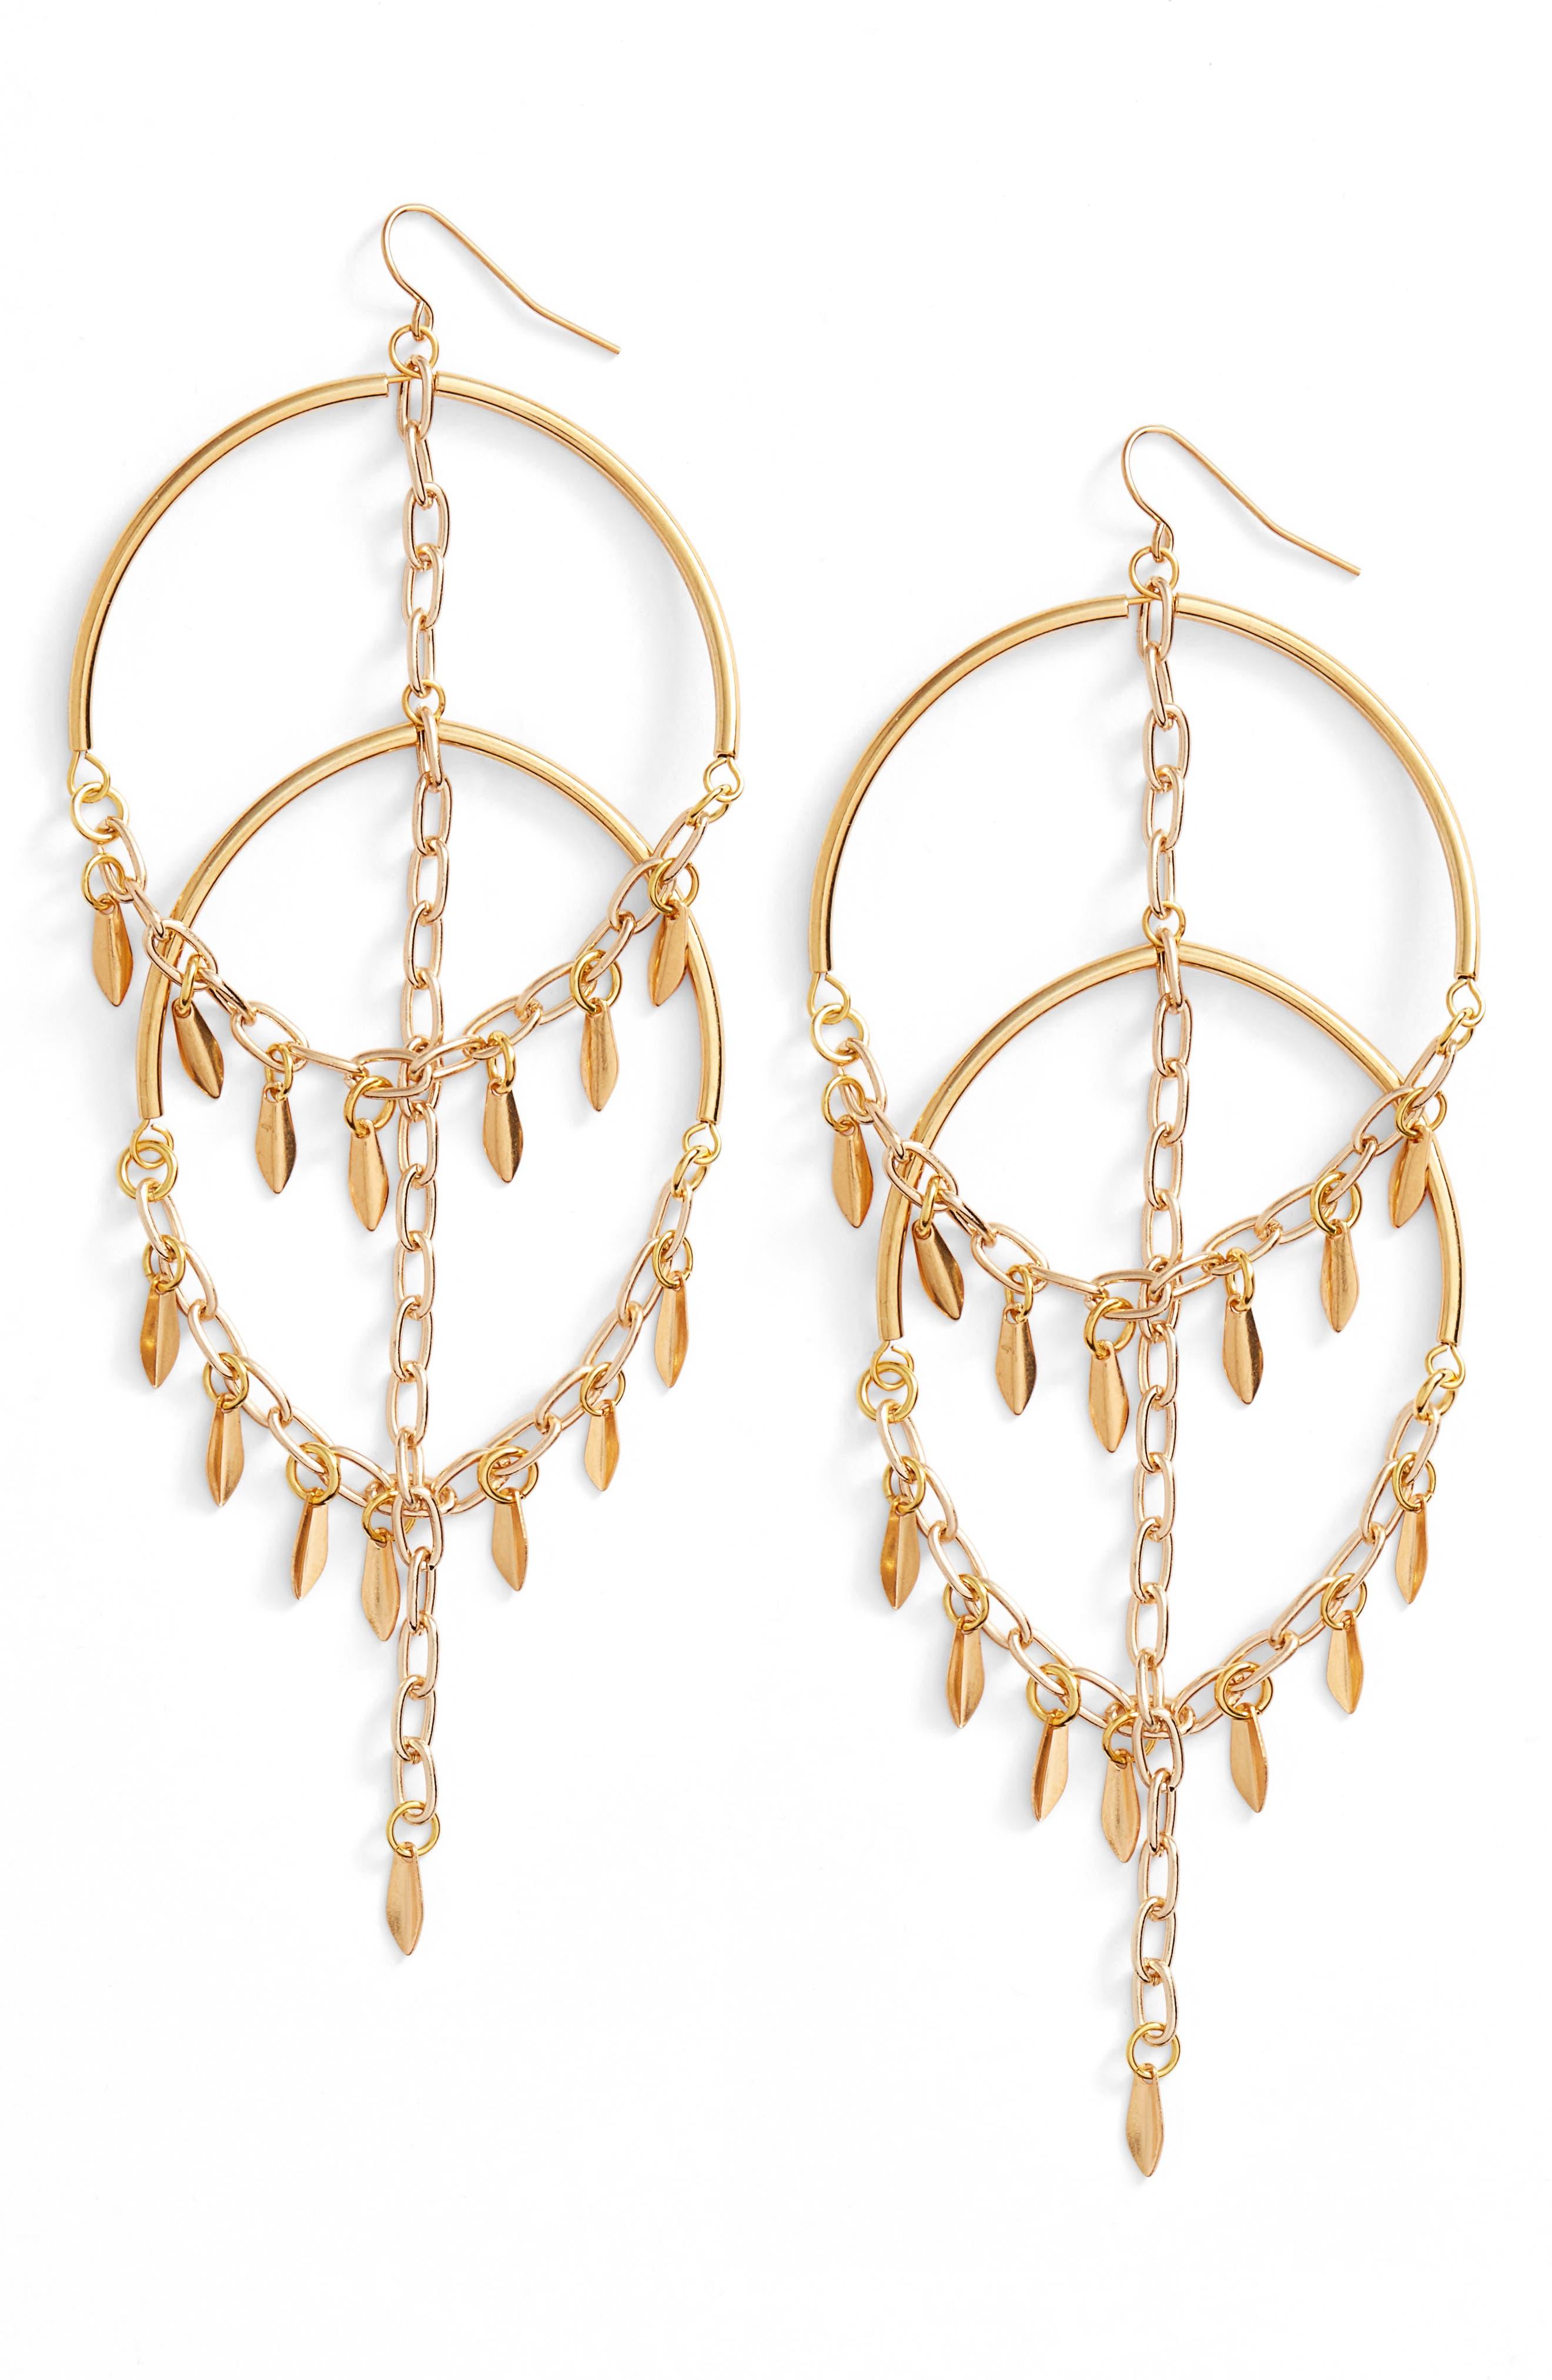 Main Image - Vanessa Mooney Cannes Chandelier Earrings